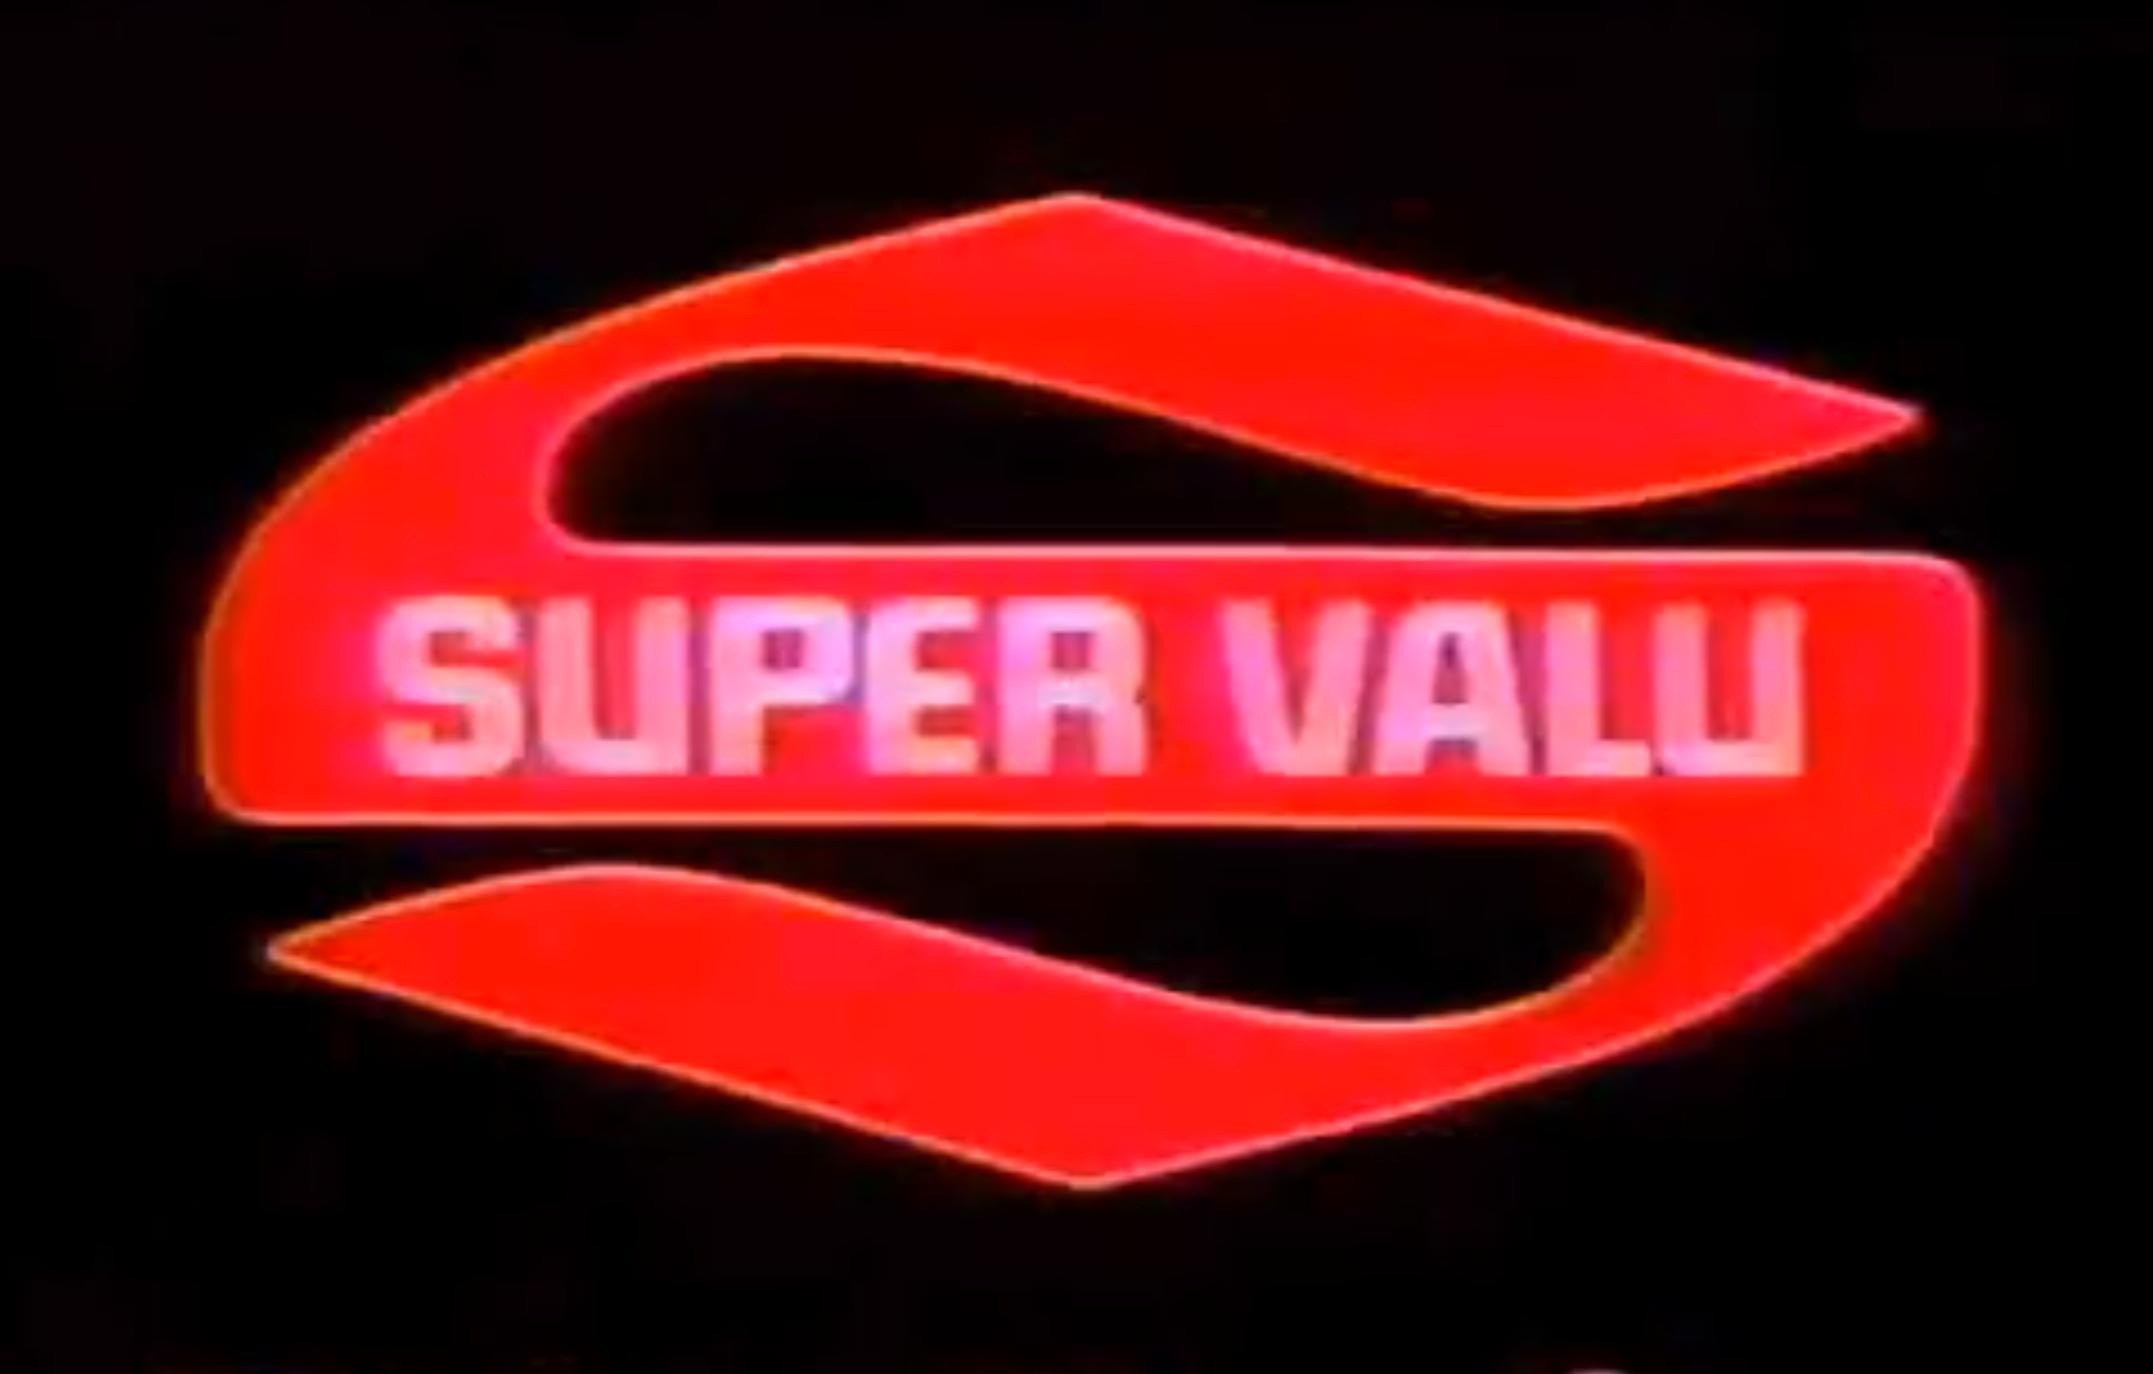 SuperValu (United States)